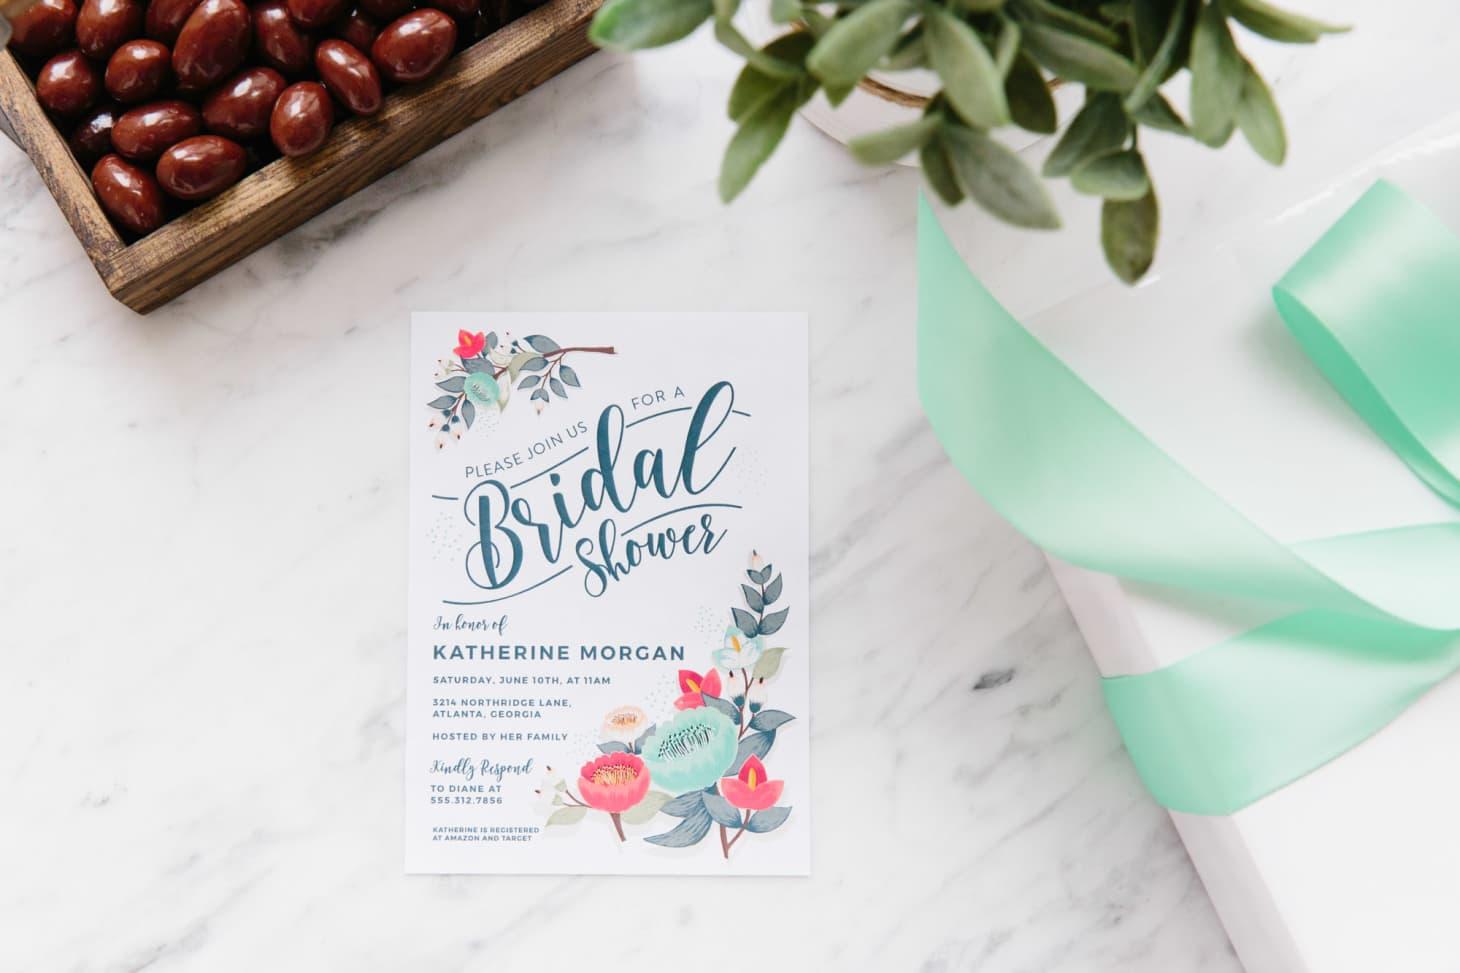 Bridal Shower Ideas Invitations Menu Themes Kitchn